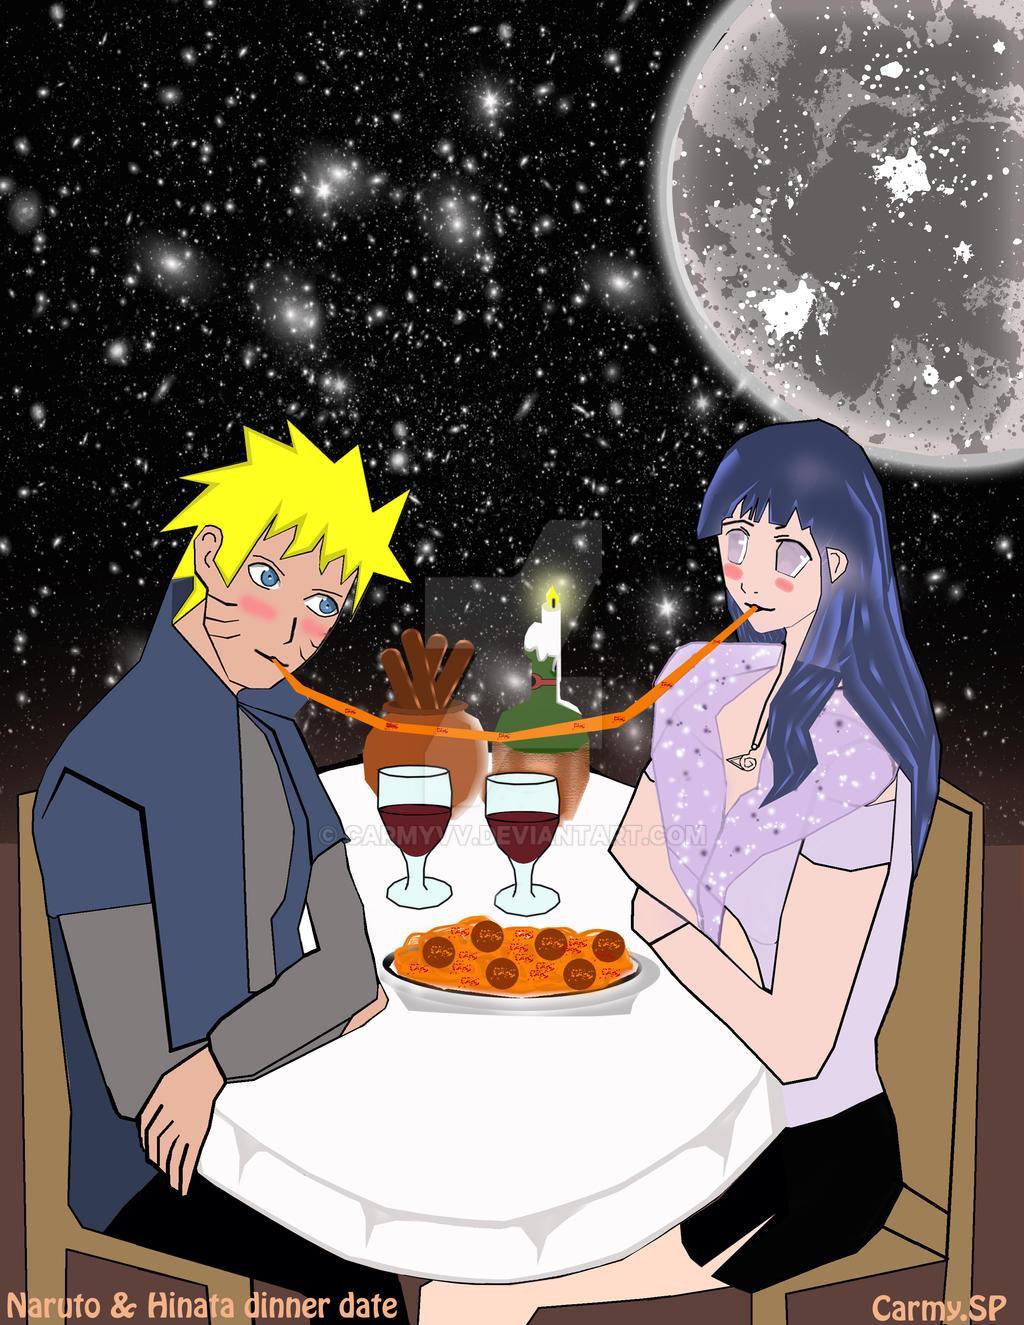 naruto and hinata date - photo #9